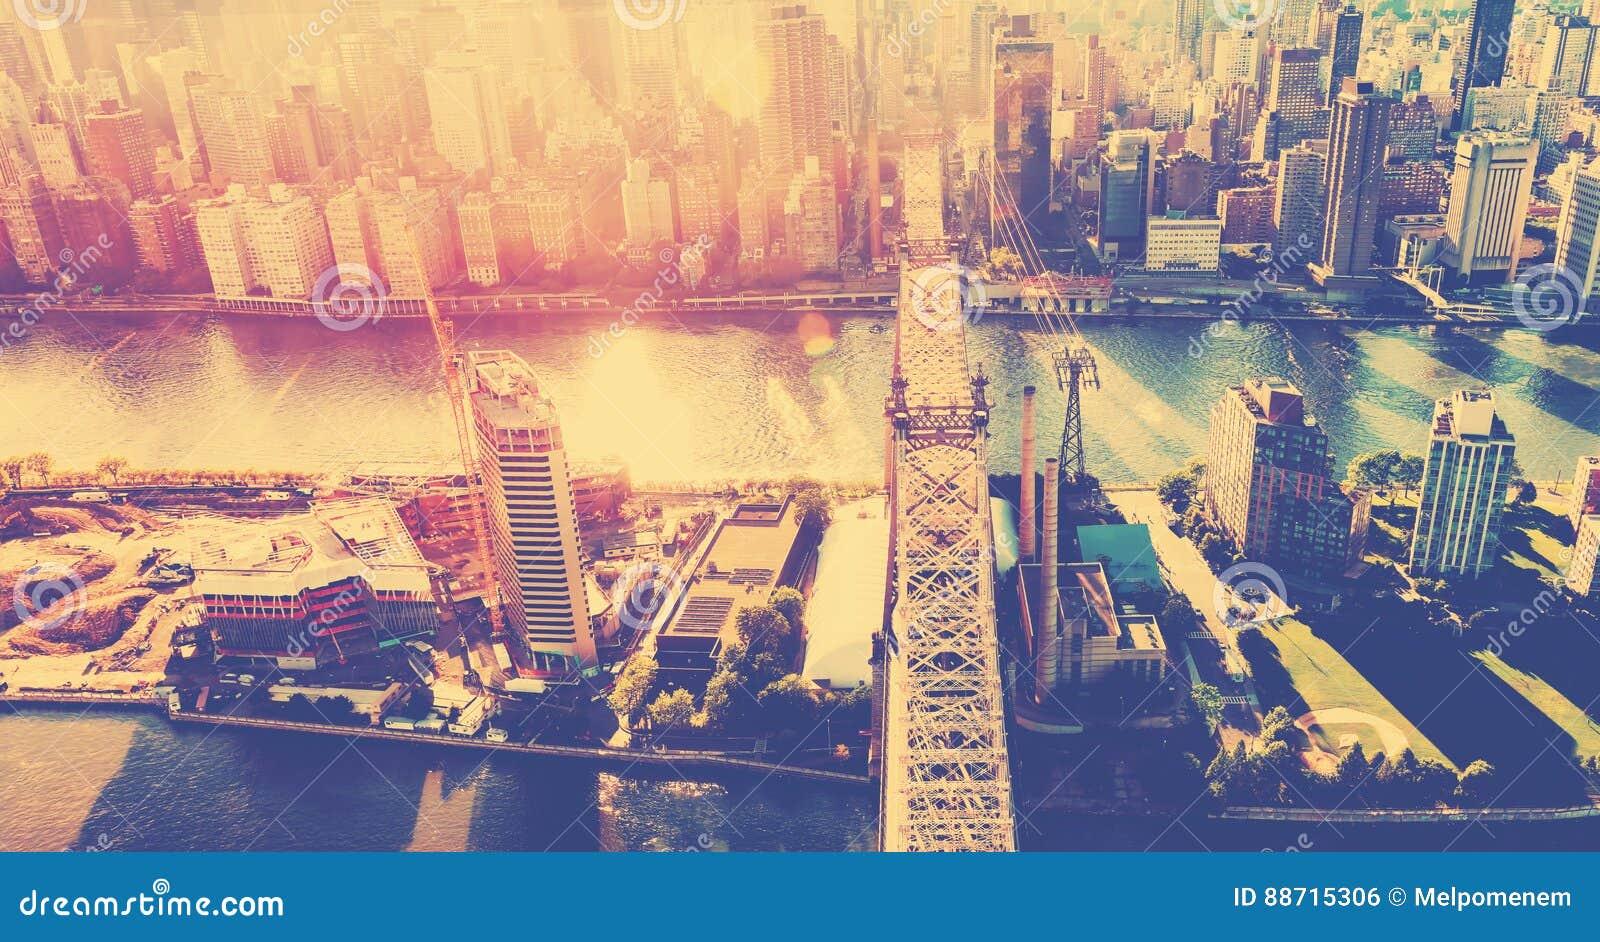 Queensboro Bridge over the East River in New York City